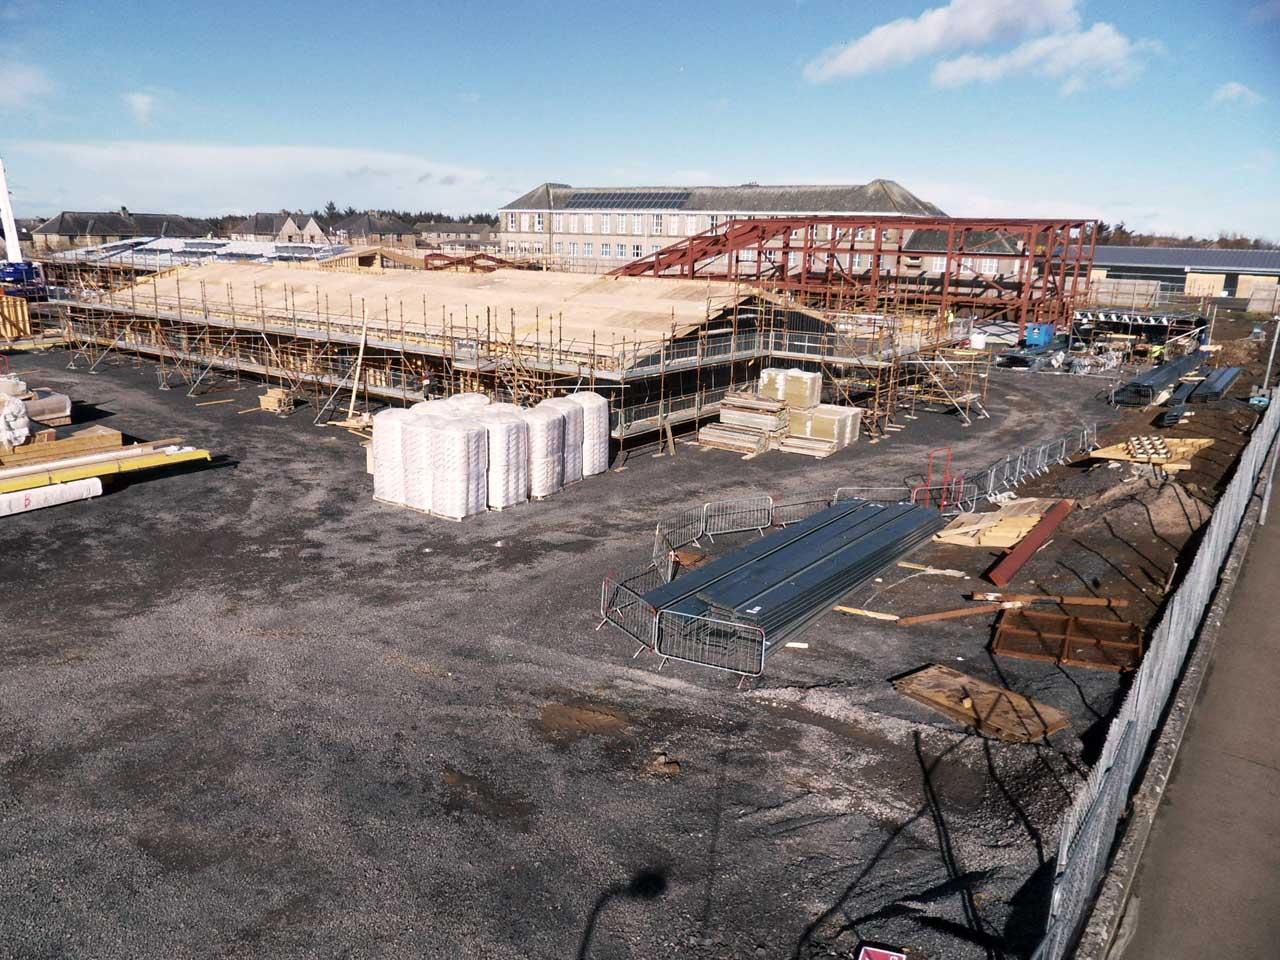 Photo: New Noss Primary School, Wick 3 March 2015